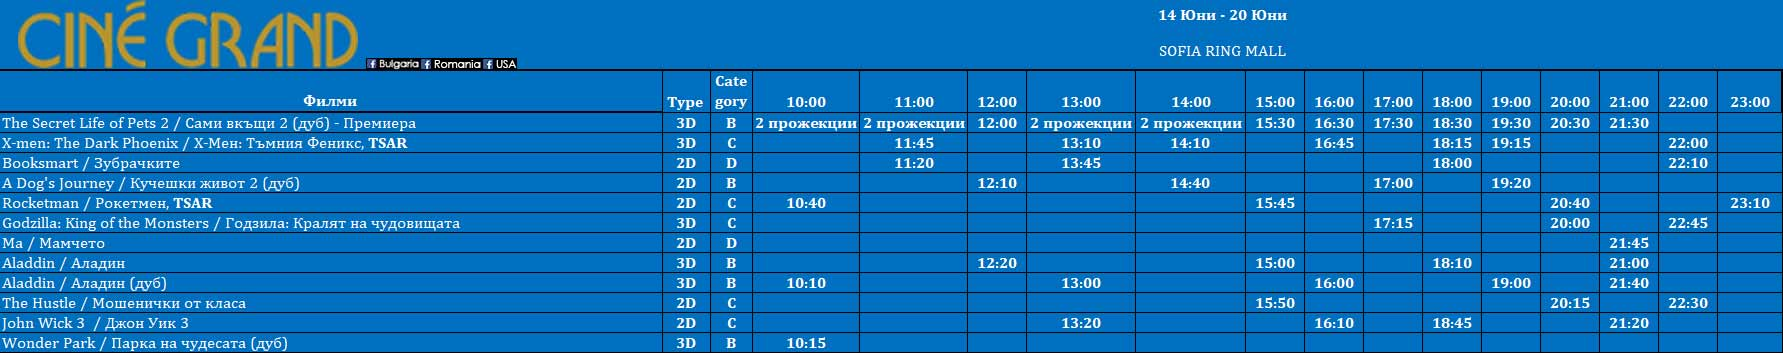 Кино програма на Cine Grand Sofia Ring Mall за периода 14 - 20 юни